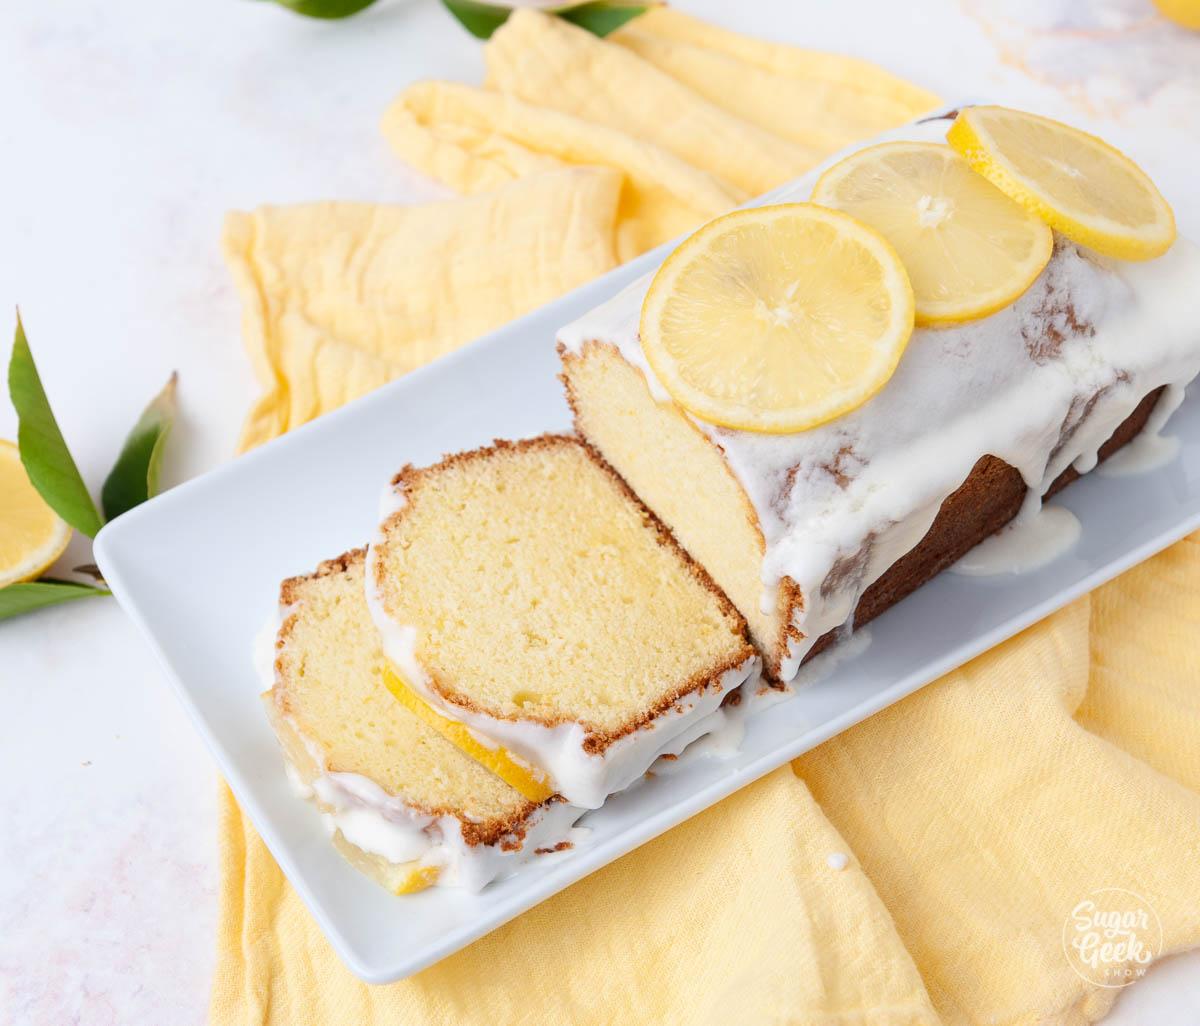 lemon pound cake on a white plate